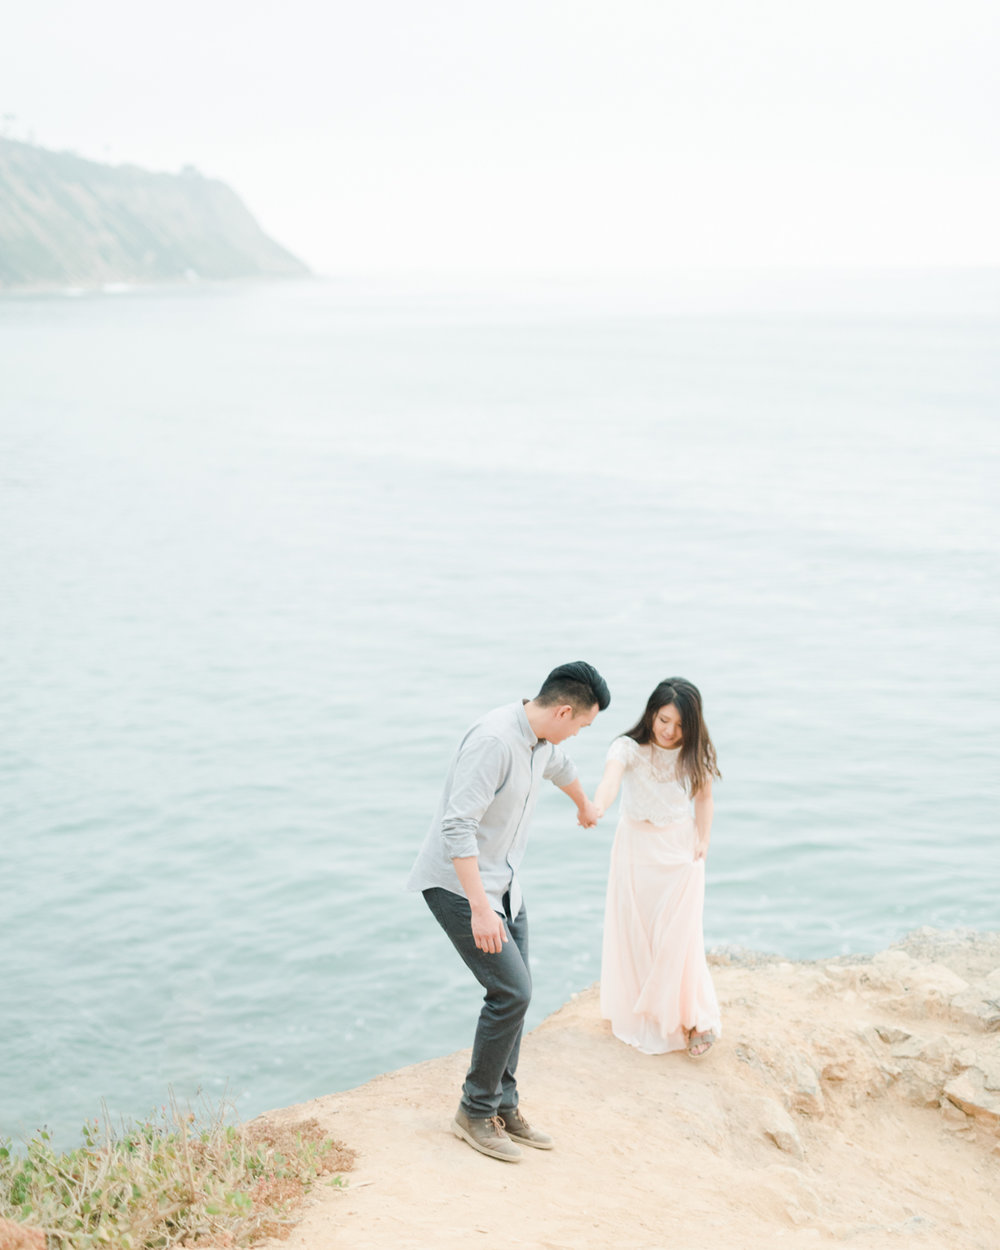 Palos_Verdes_Beach_Engagement_Session_Los_Angles_Fine_Art_Wedding_Photographer_20.jpg